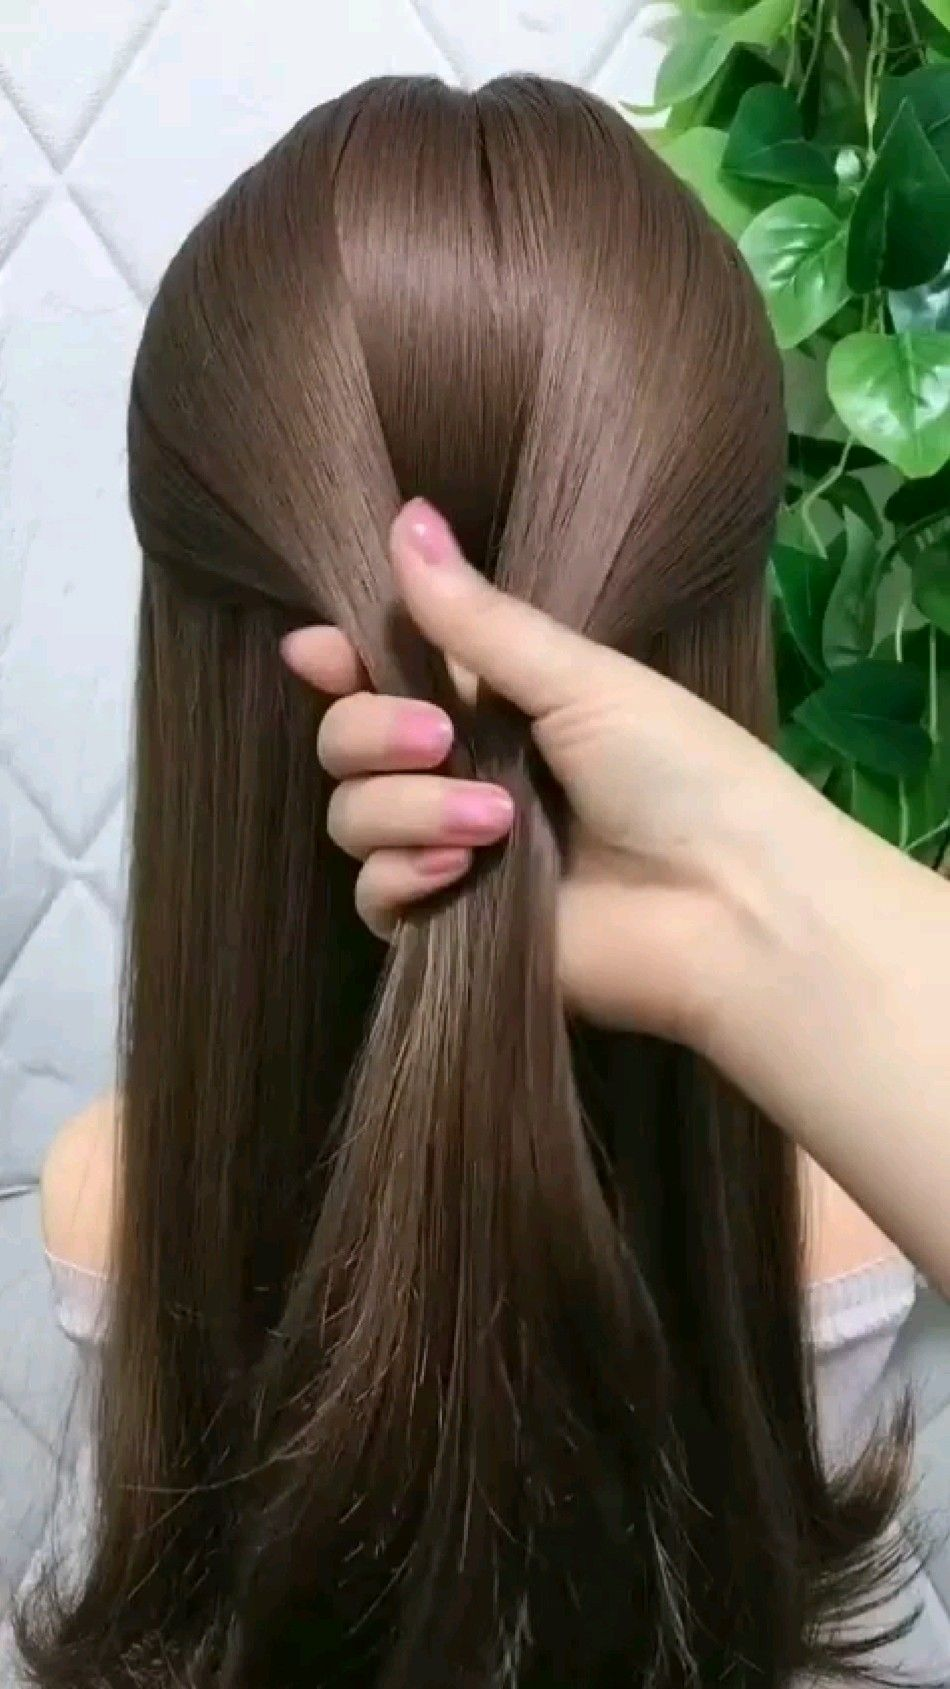 Woman hair style #1